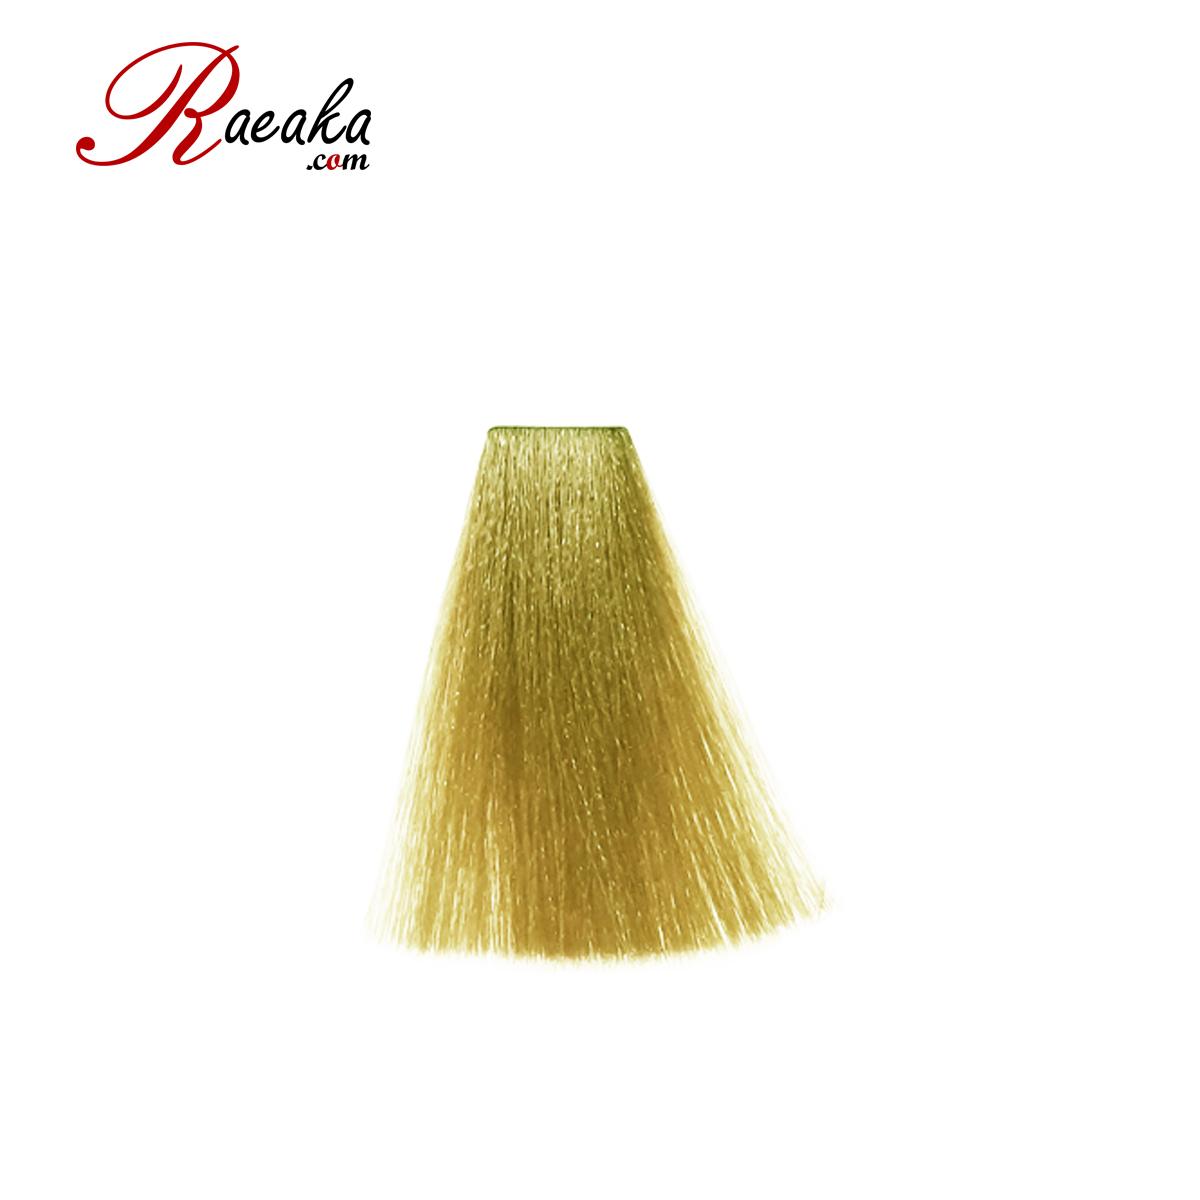 رنگ مو دوماسی سری بژ بلوند بژ روشن ۸٫۳۱ حجم ۱۲۰ میلی لیتر